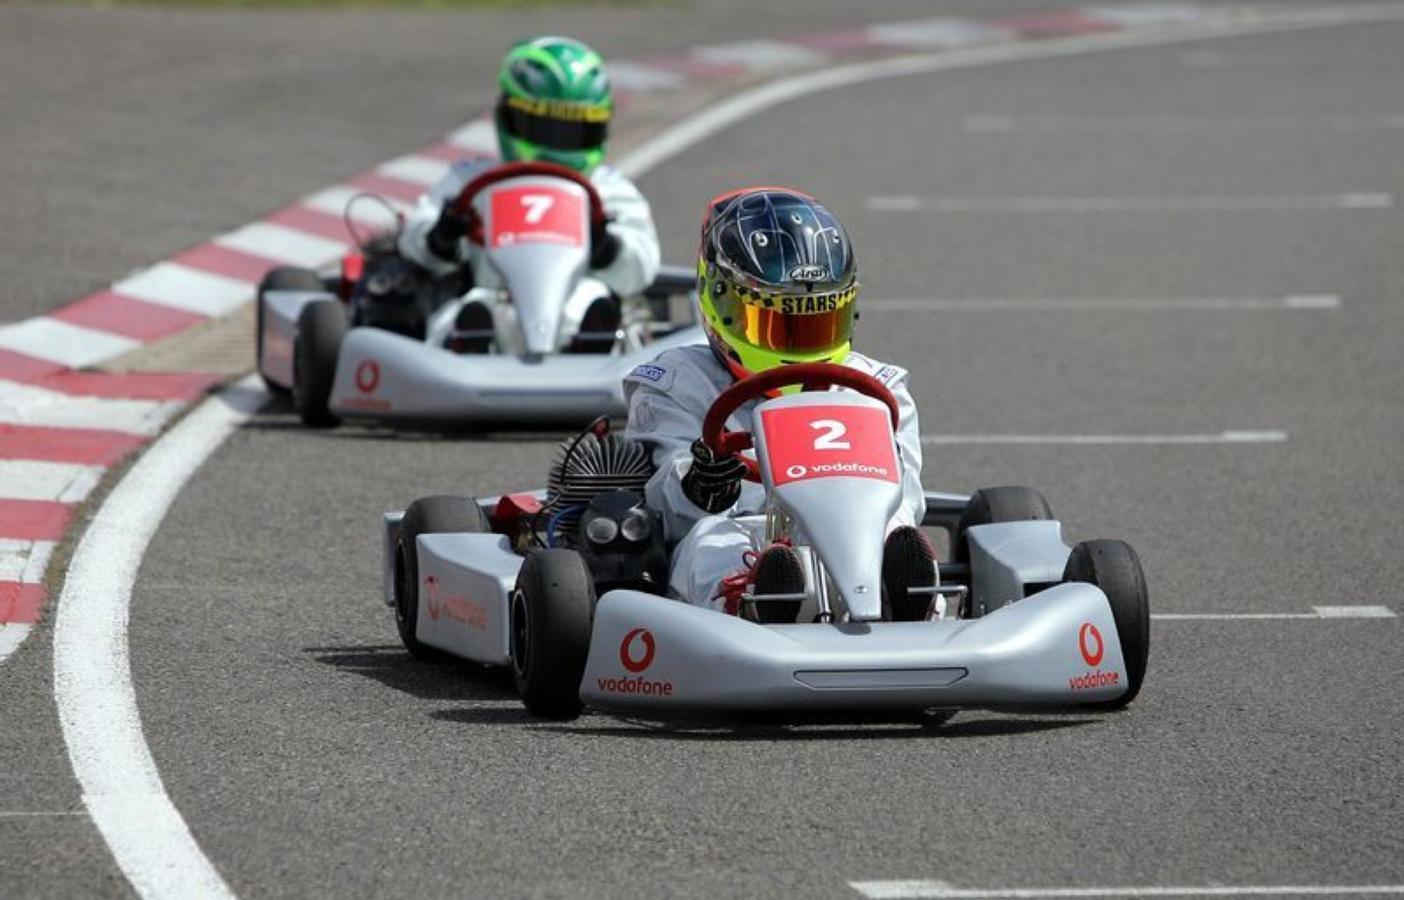 Go Kart Track   Tracks   Las Vegas Motor Speedway